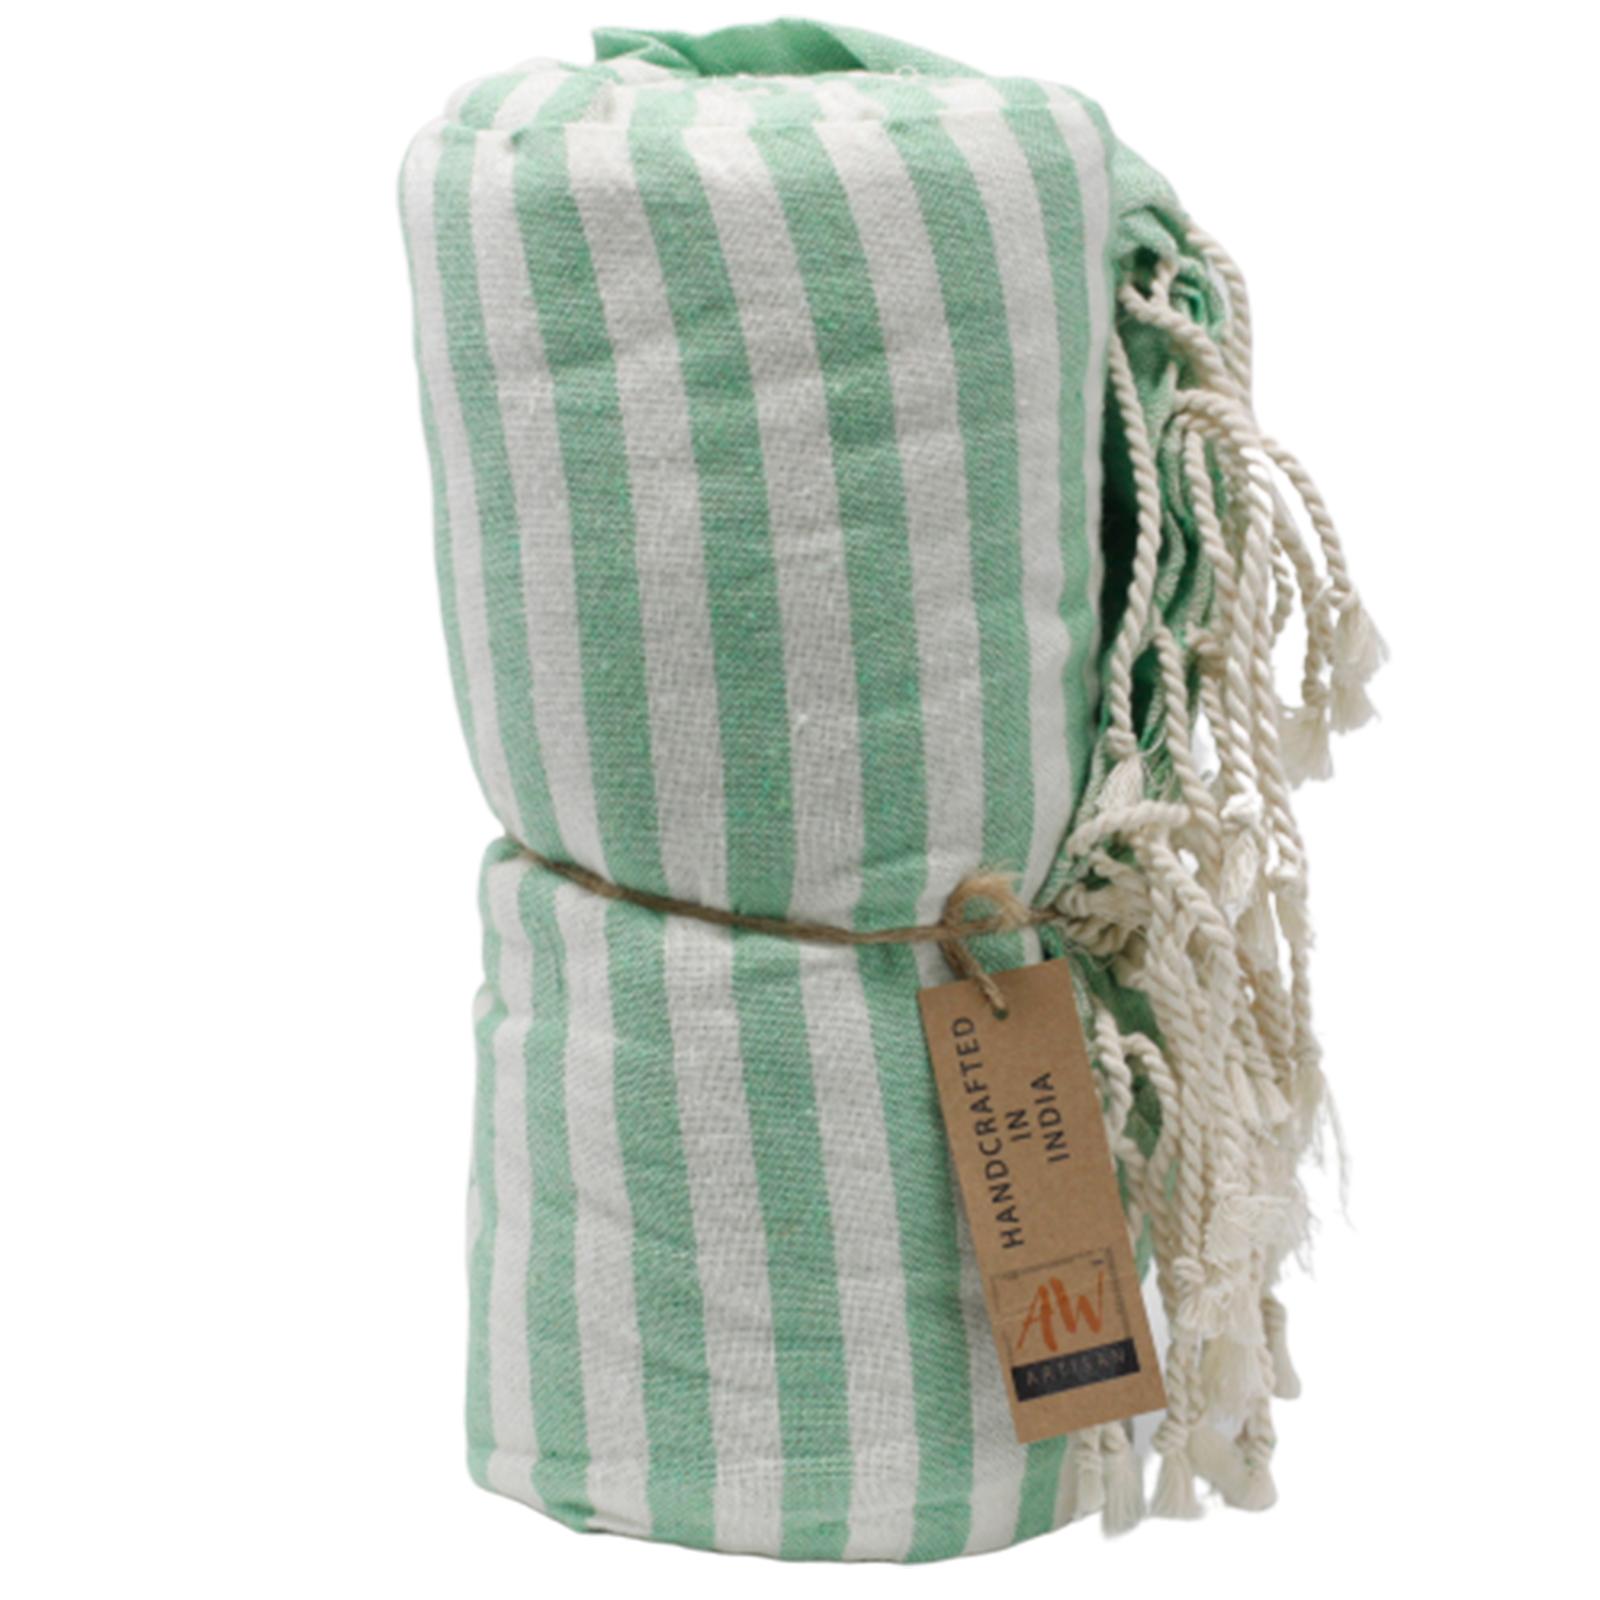 Cotton Pario Towel 100x180 cm Picnic Green